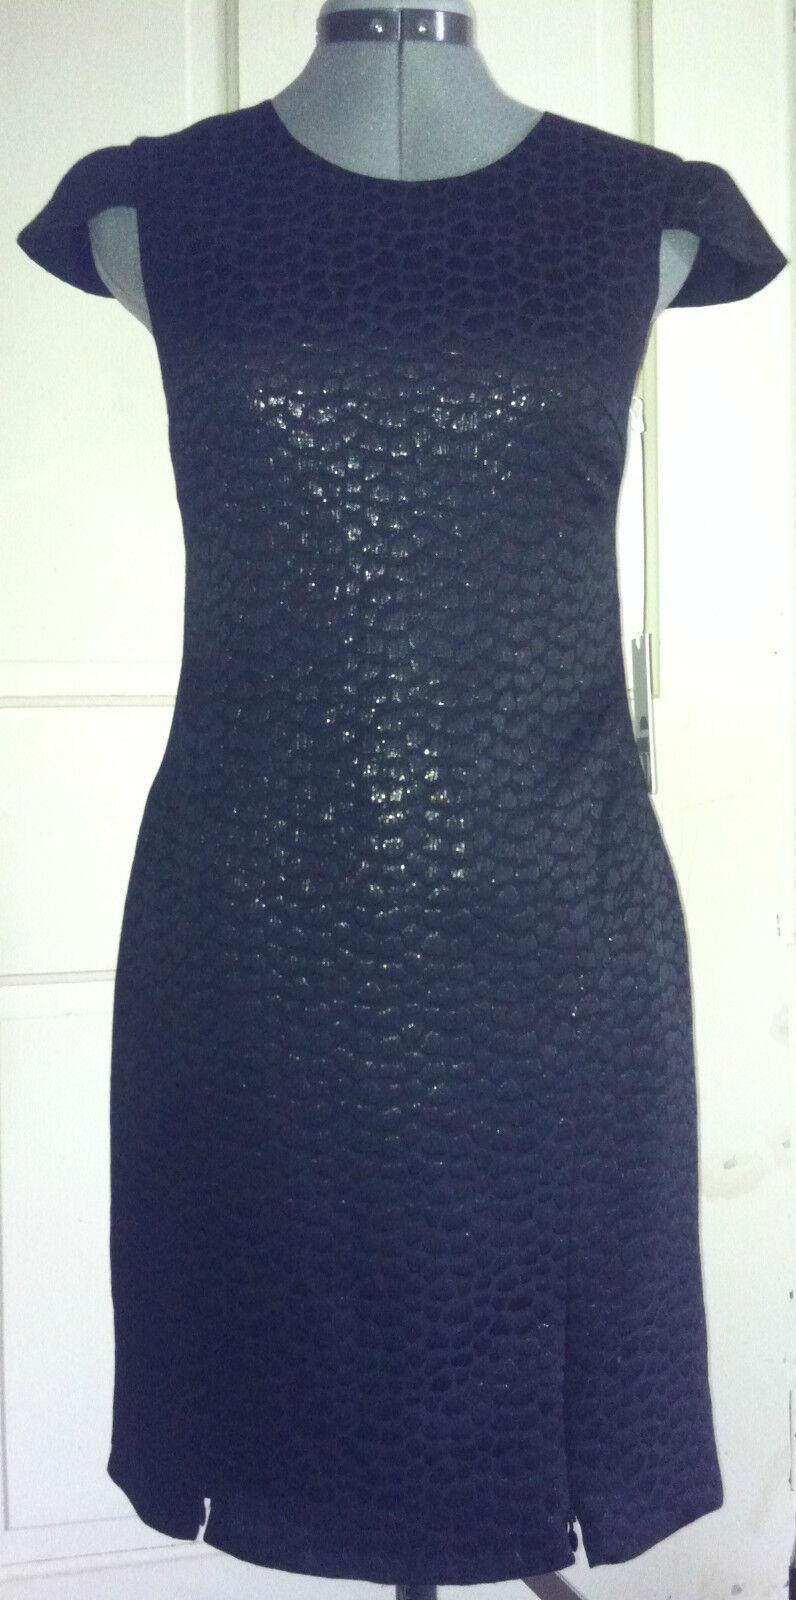 2brych Croc-Embossed Cap-Sleeve Metallic Sheath Dress Größe 0 XS-schwarz-NWT--2